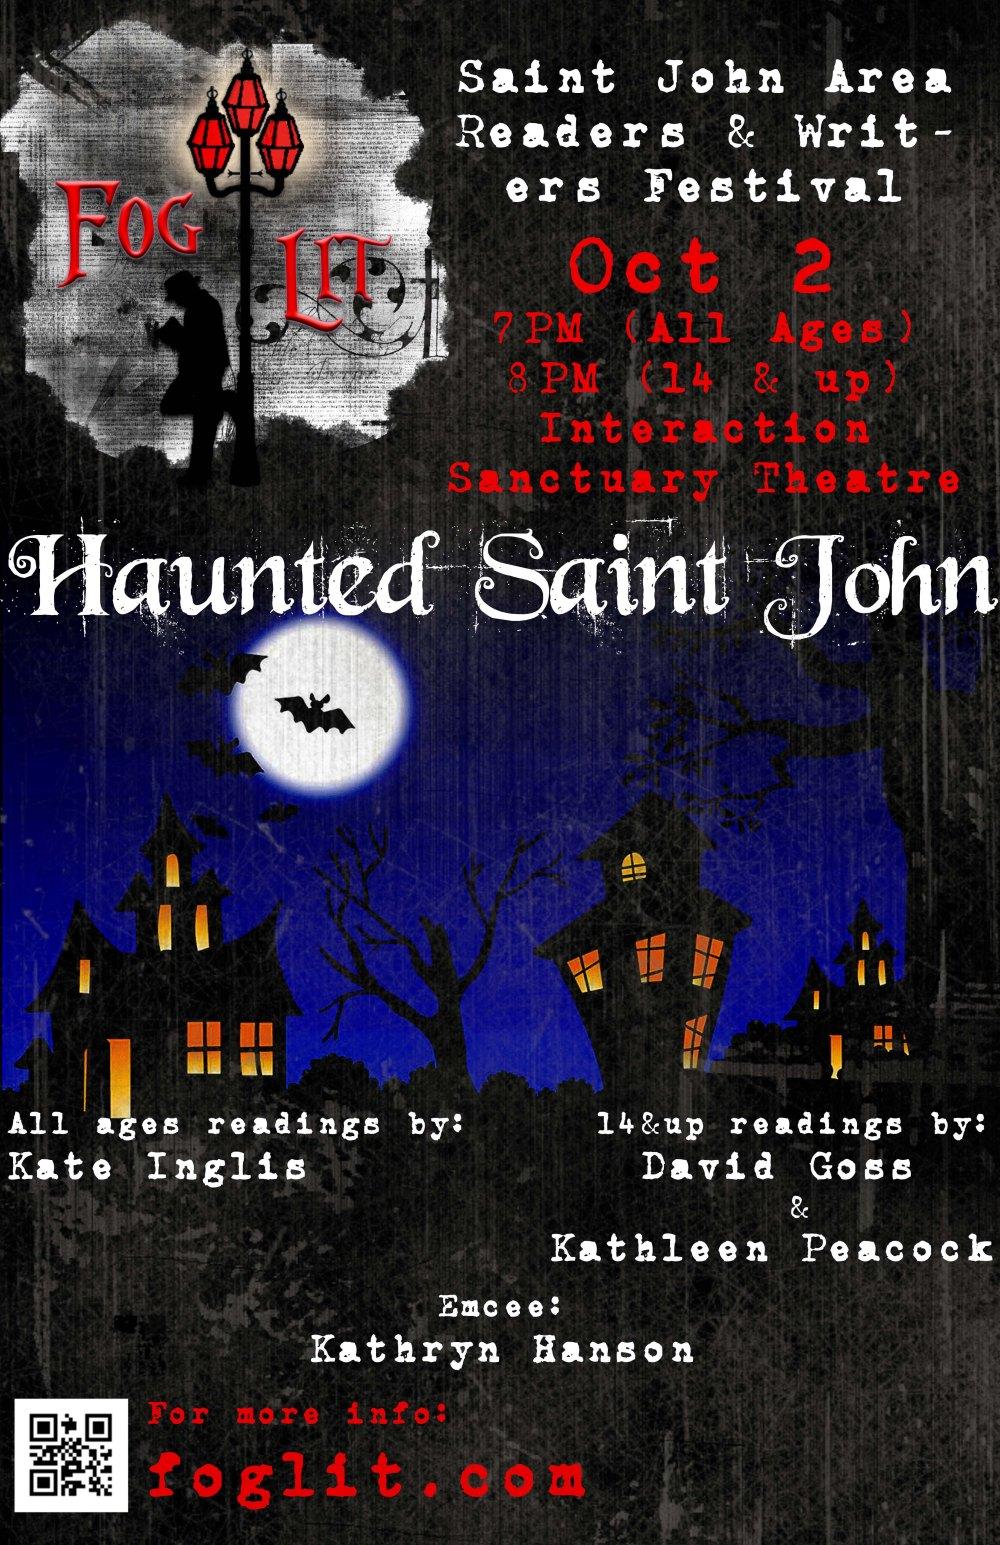 2015_Poster_HauntedSJ_QA